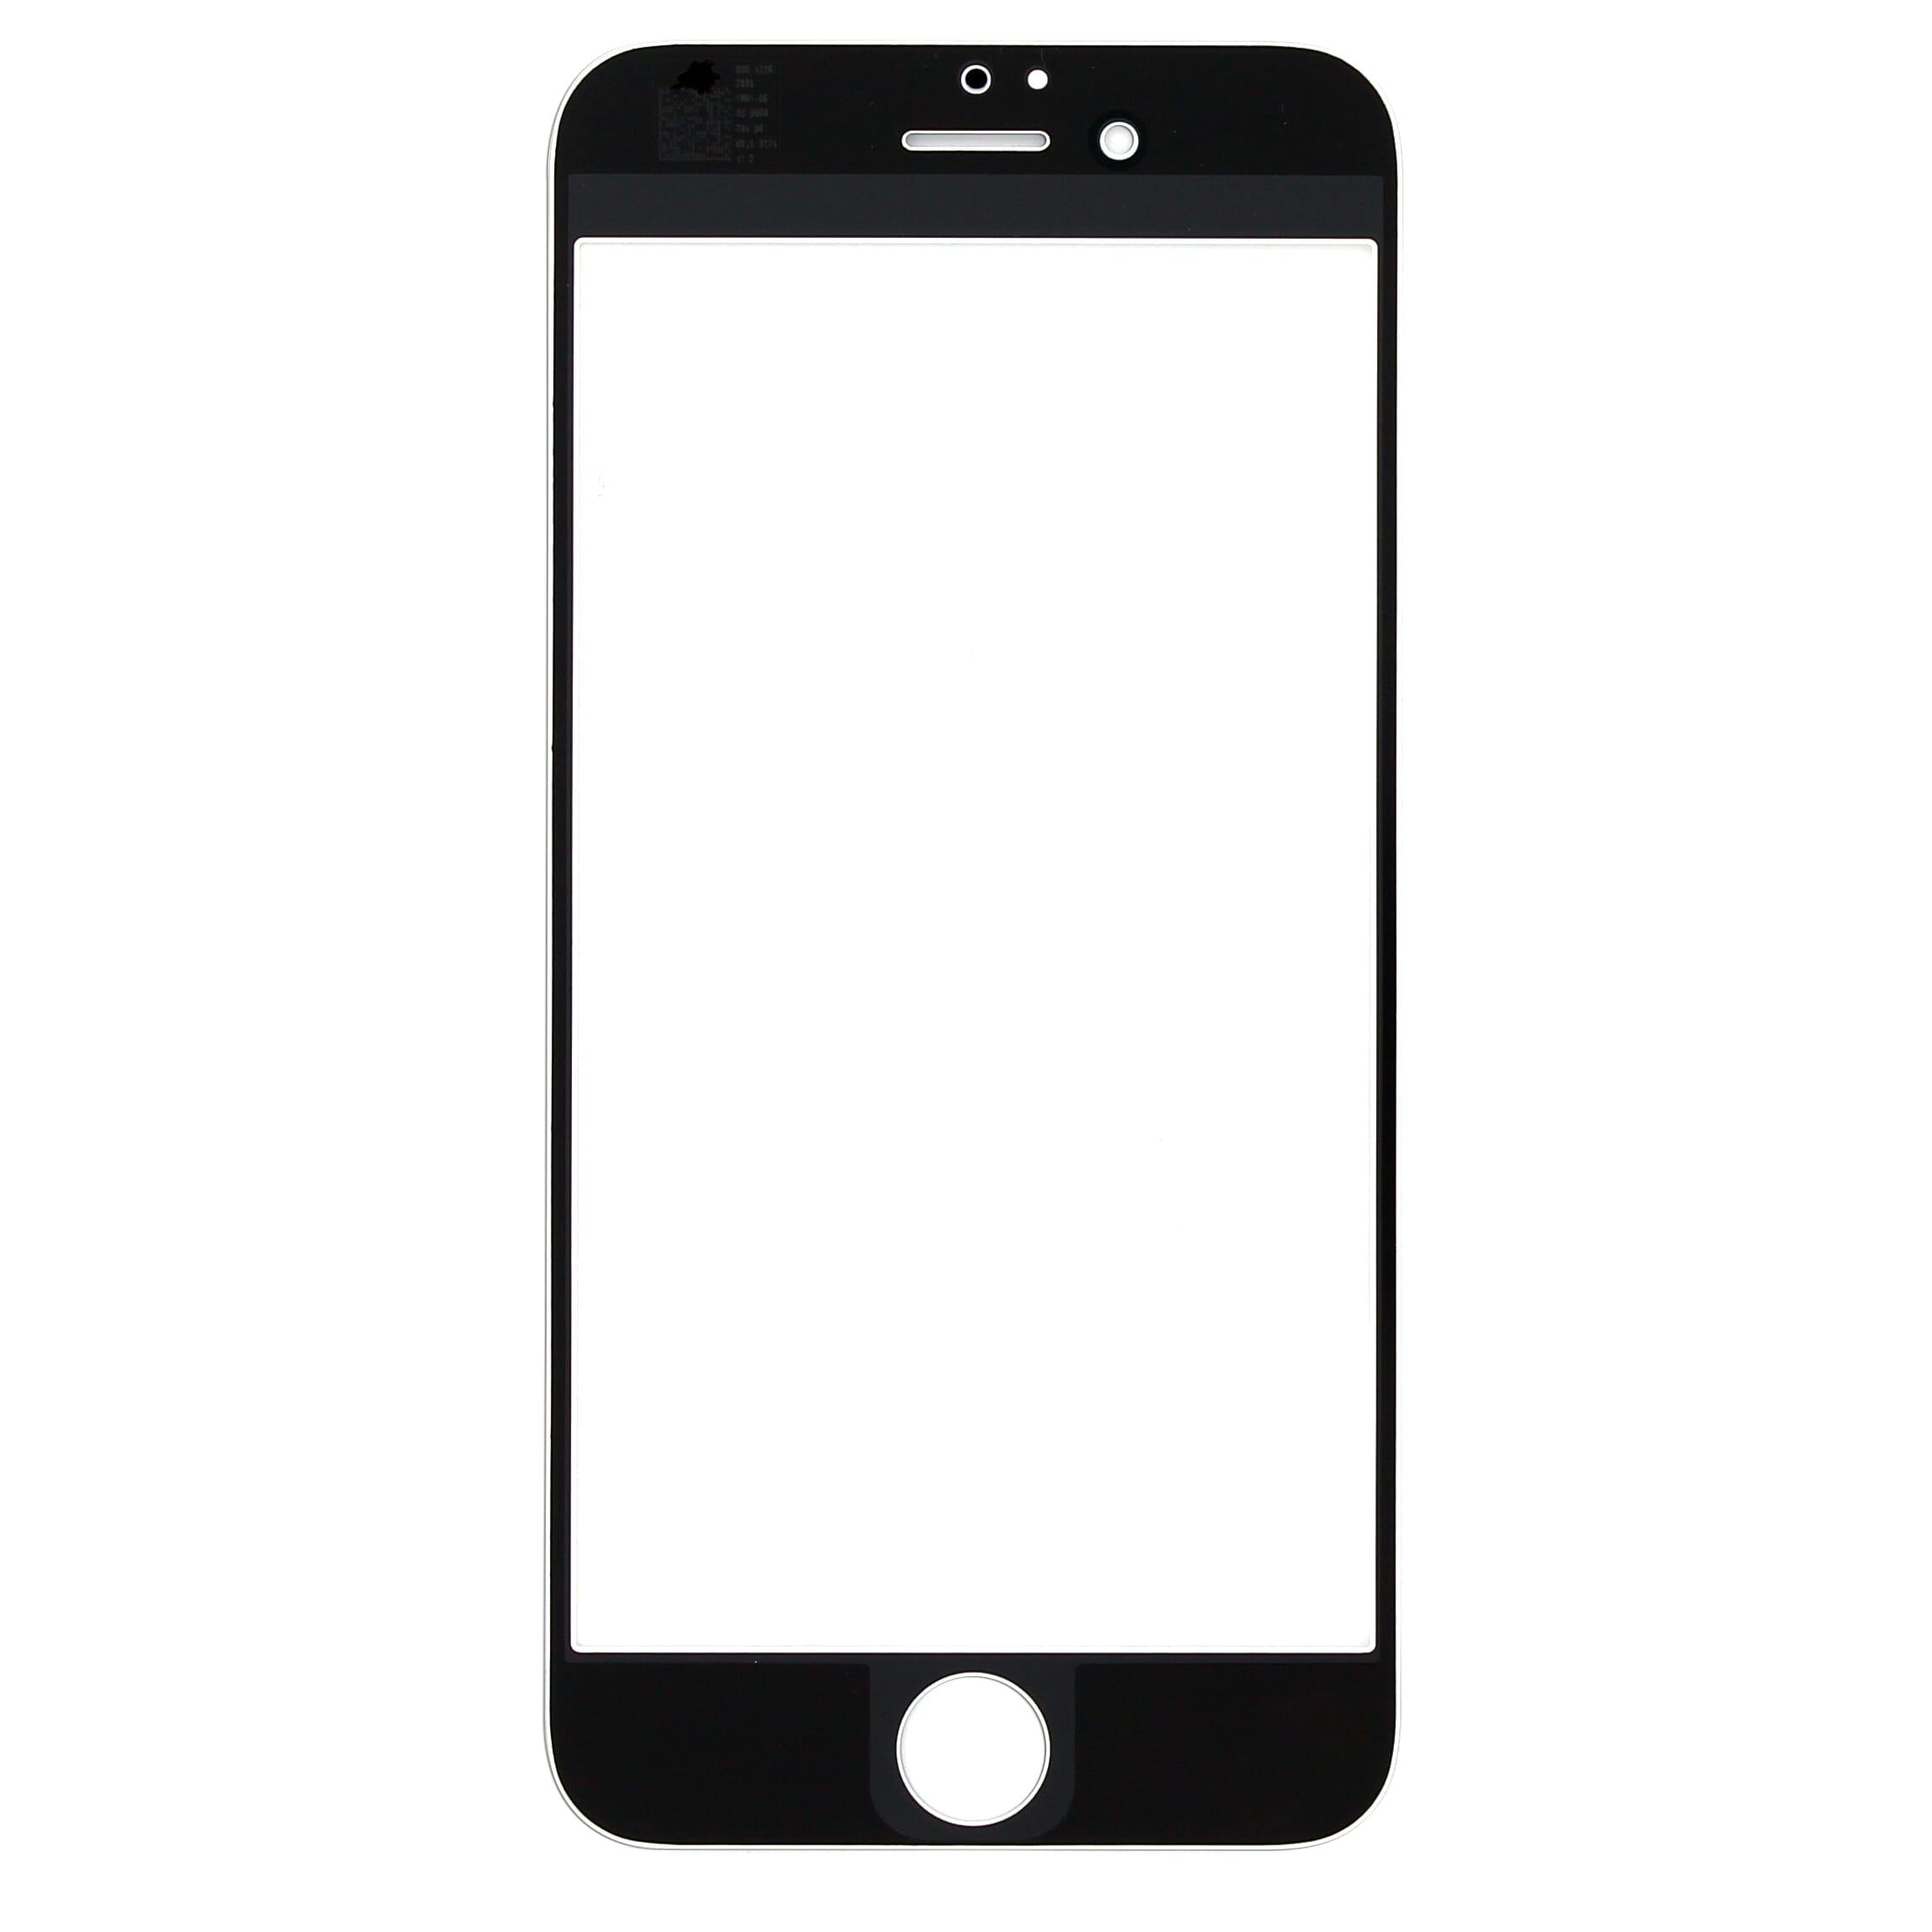 iphone 6 glass lens weiss voor apple iphone 6 p0172475. Black Bedroom Furniture Sets. Home Design Ideas